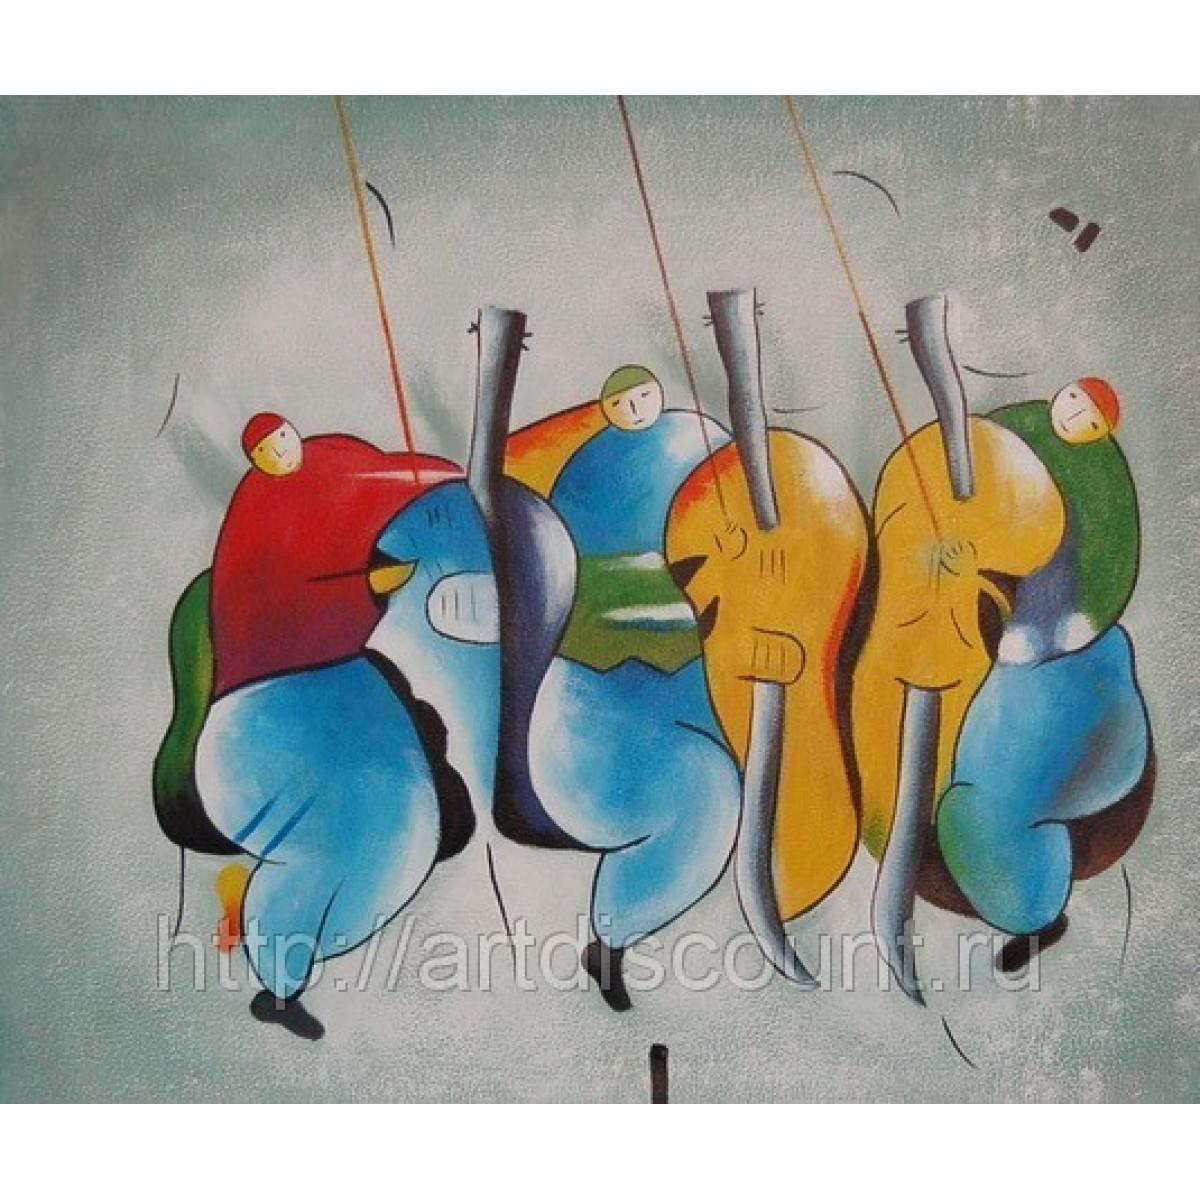 "Картина ""Трио"" холст, масло, 50х60см"